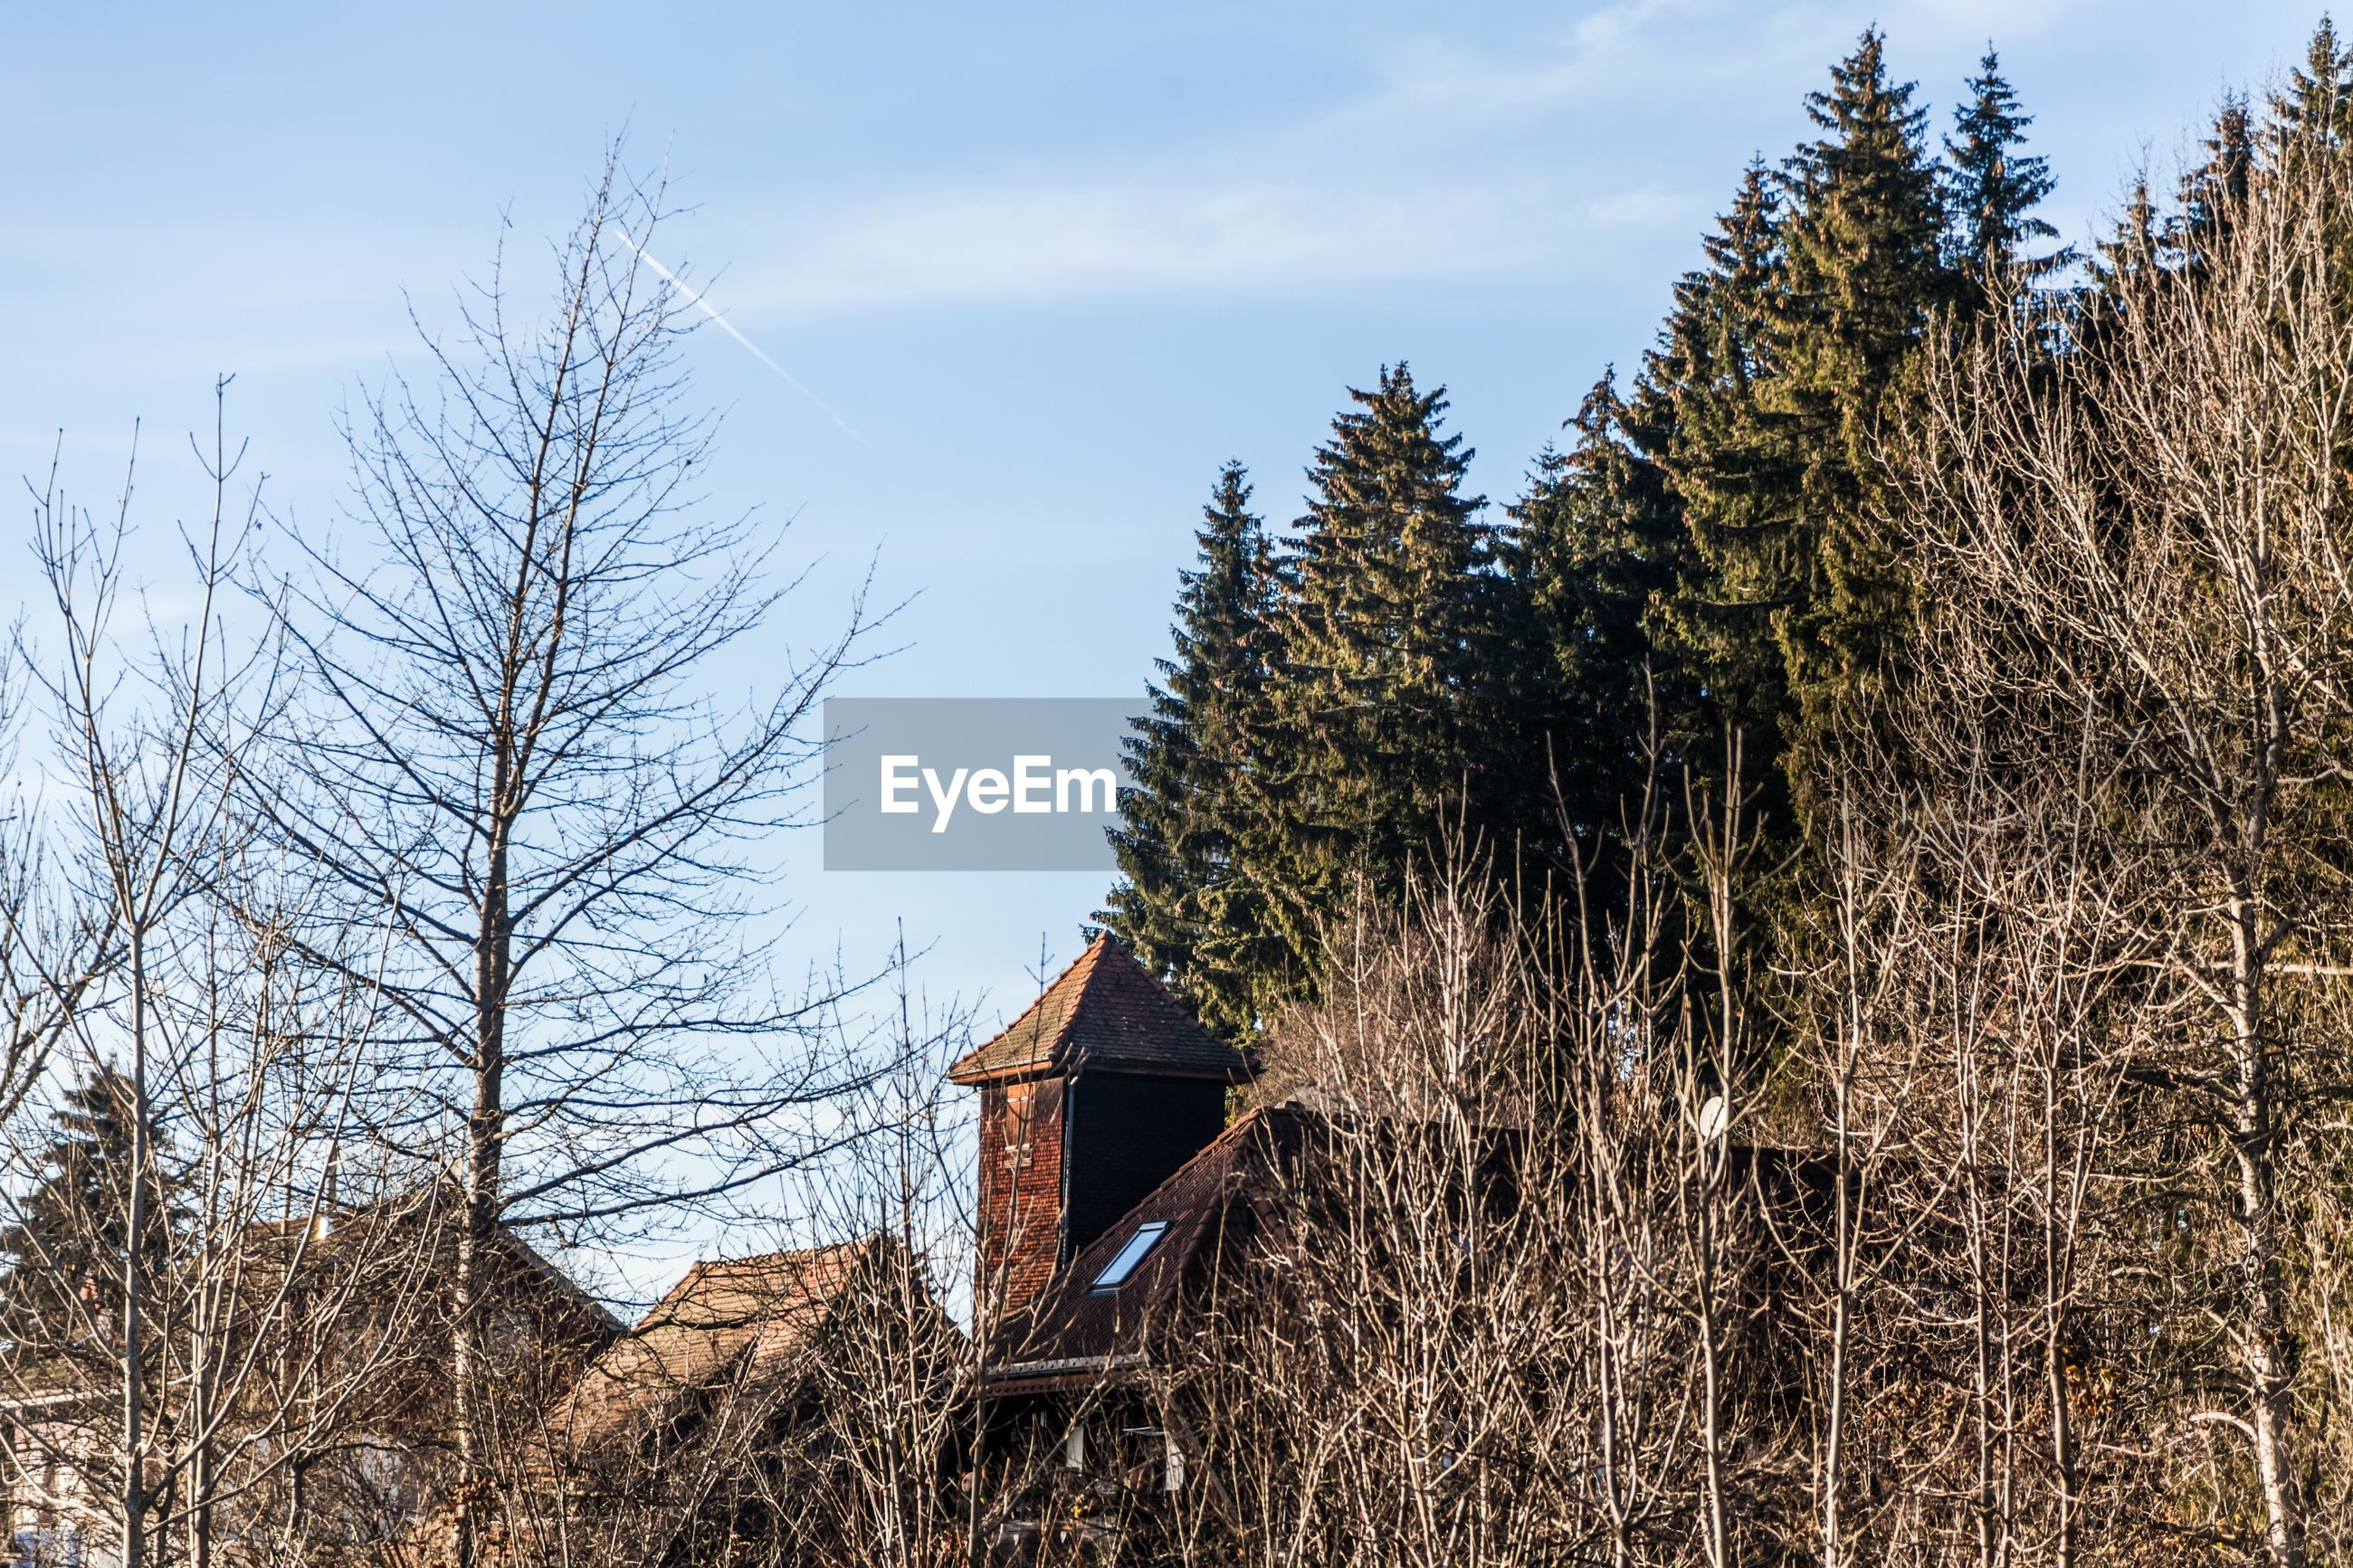 BARE TREES AGAINST HOUSE